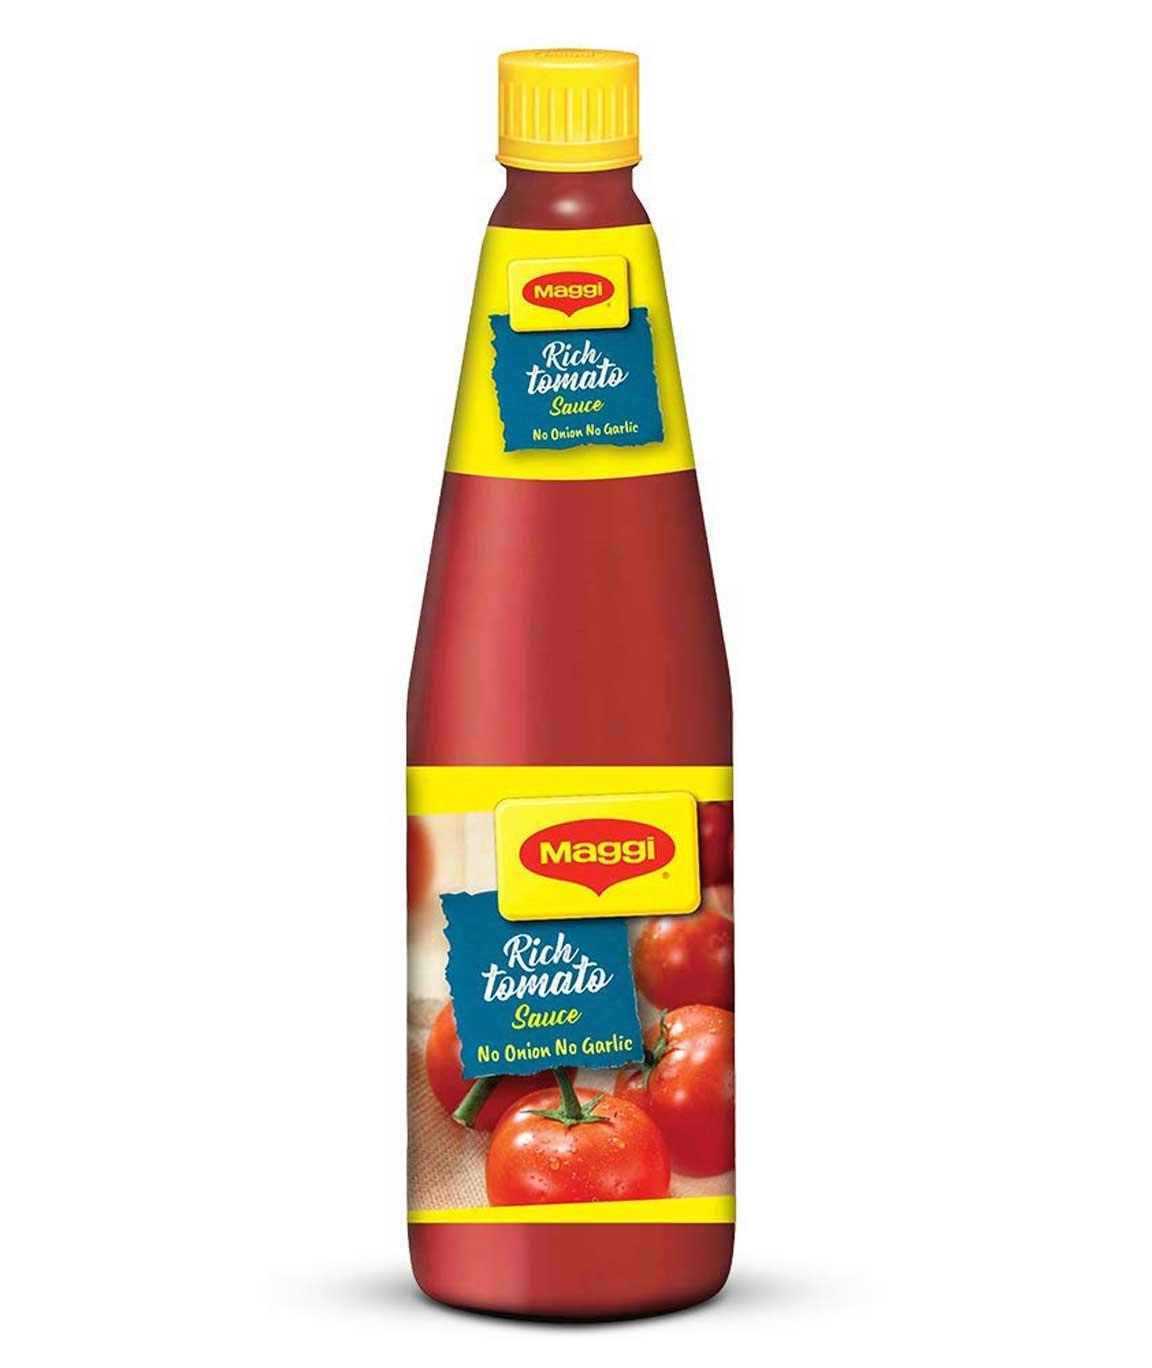 Nestle Maggi Tomato Sauce, No Onion No Garlic, 500g Bottle